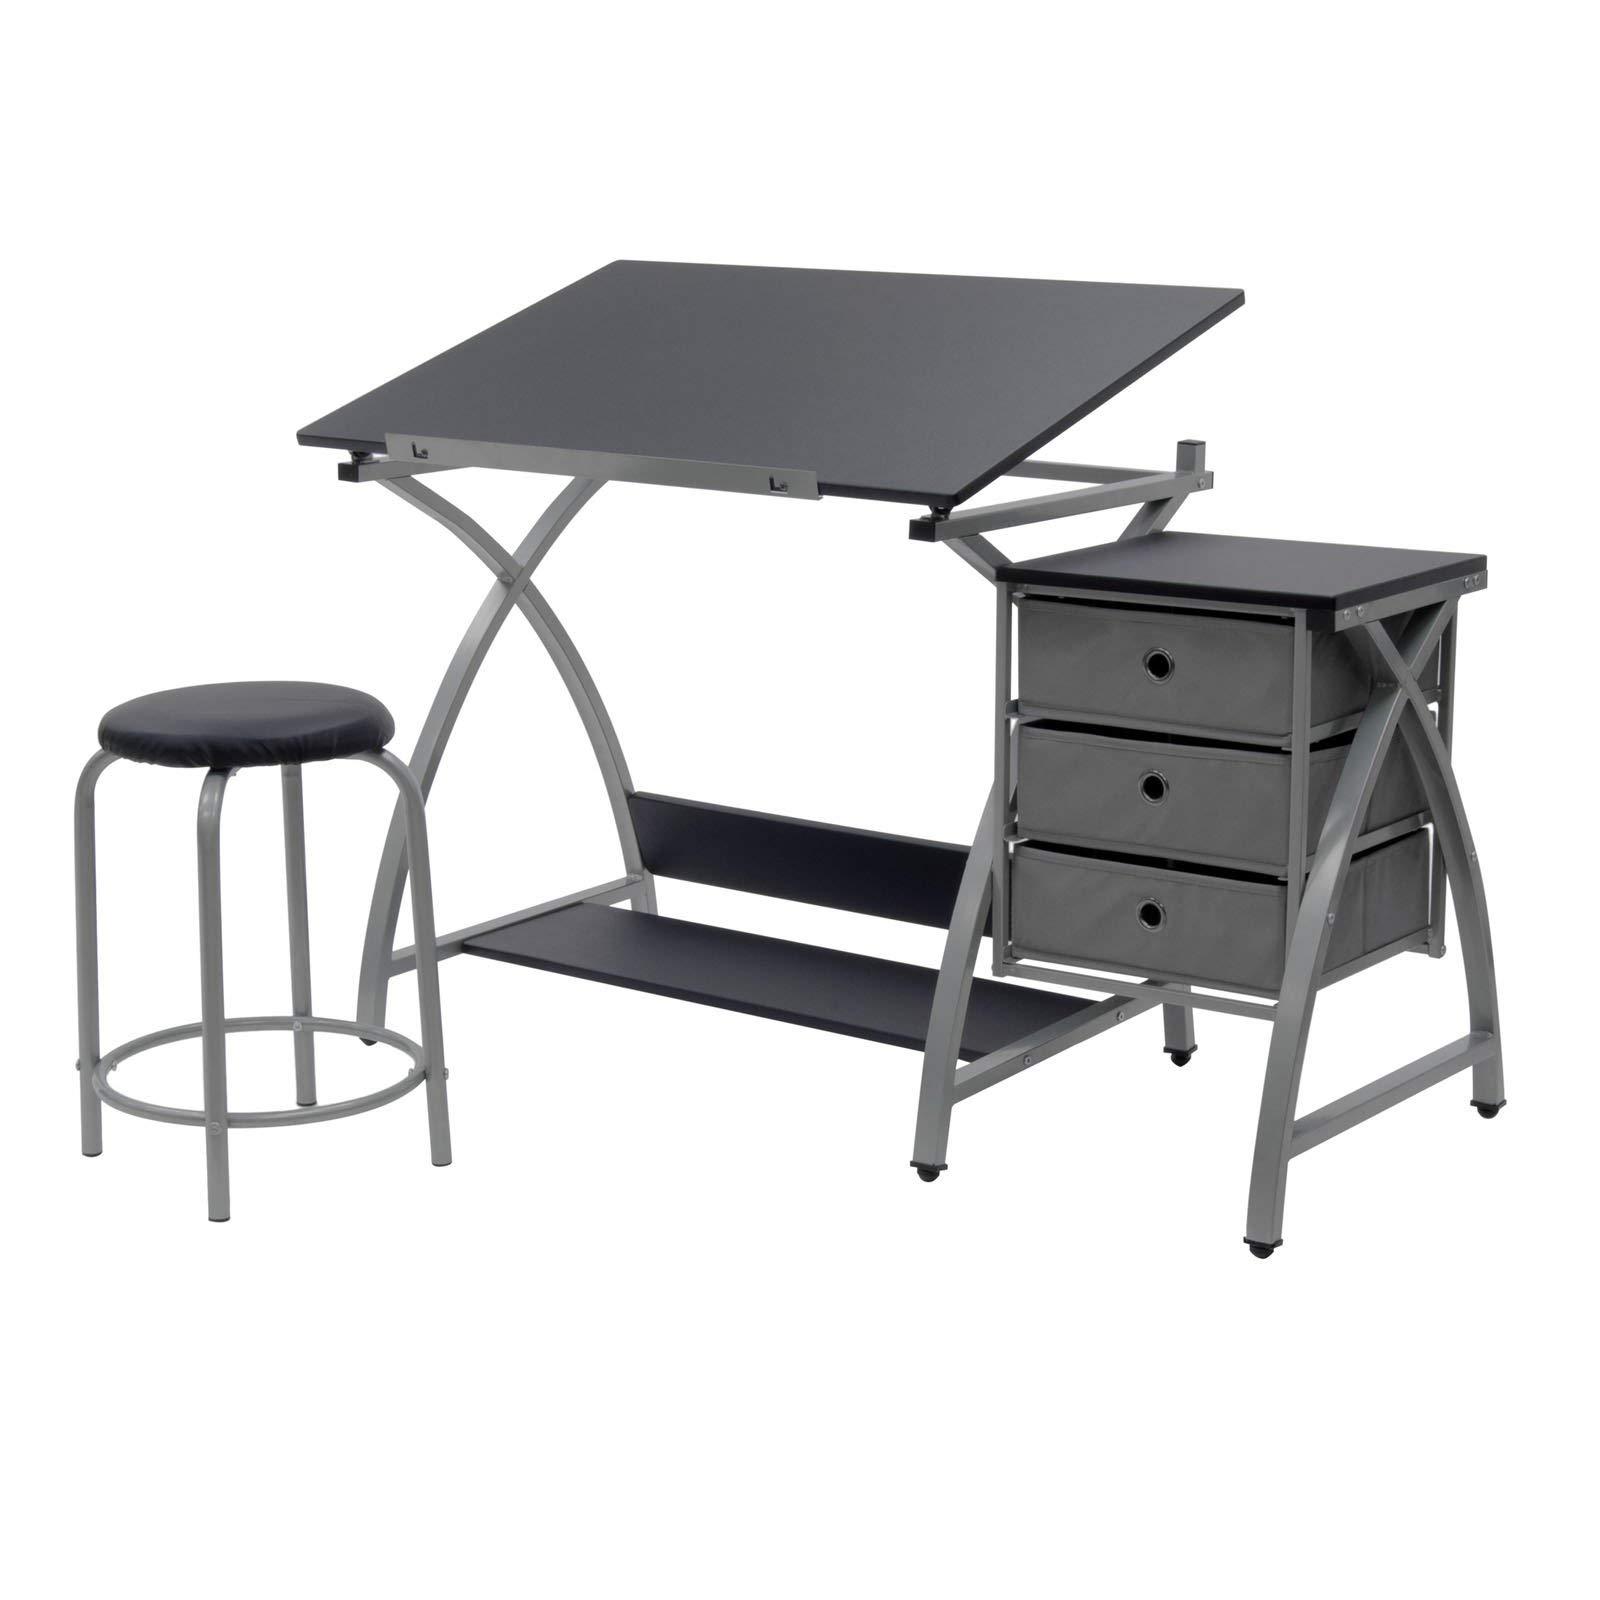 Studio Designs Laminate Craft Table Comet Center with Stool, Black (2 Pack) by STUDIO DESIGNS INSPIRING CREATIVITY WWW.STUDIODESIGNS.COM (Image #2)